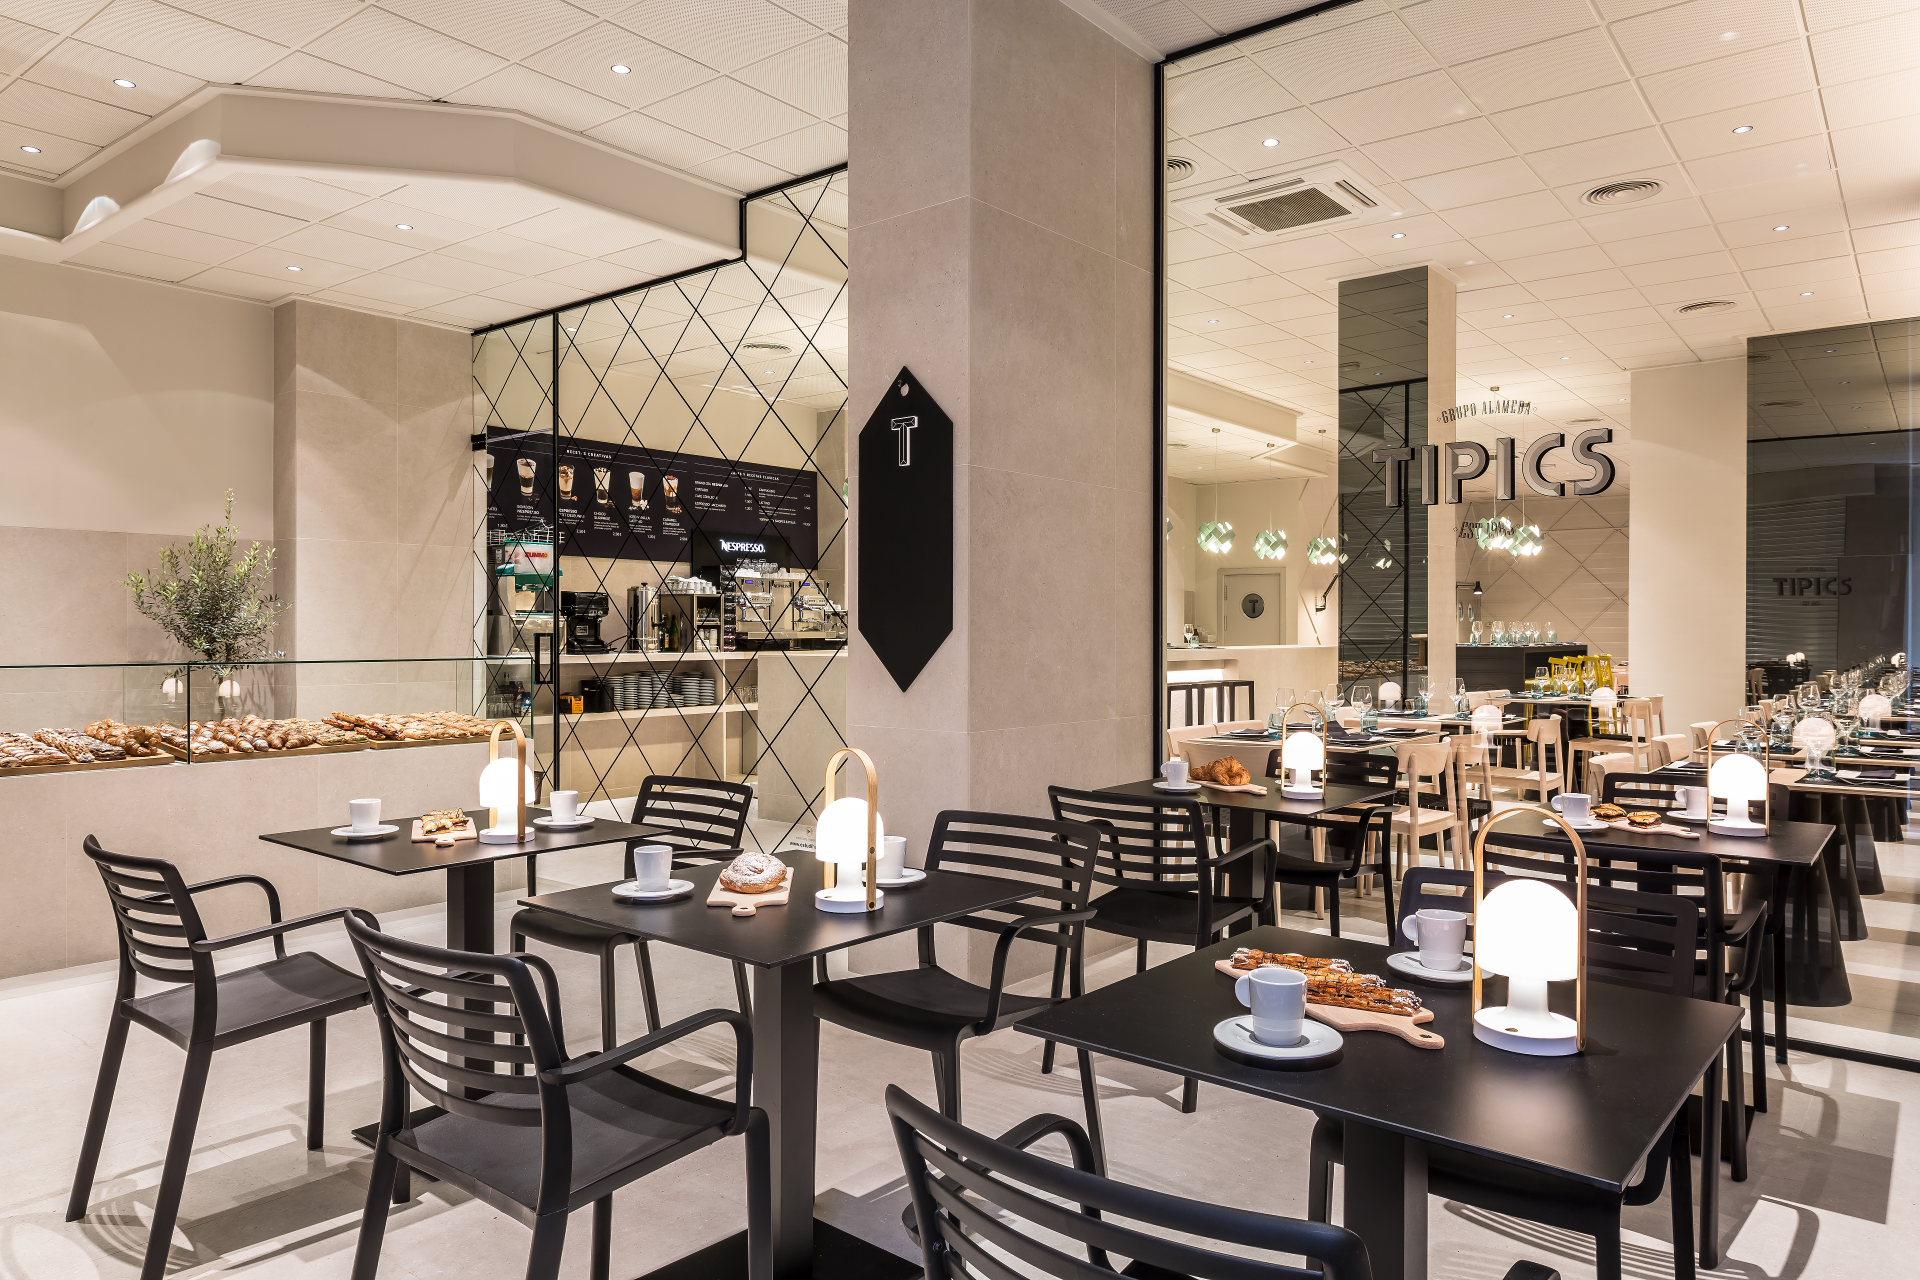 fotografia-arquitectura–interiorismo-valencia-german-cabo-estudihac-restaurante-tipics-xativa (4)